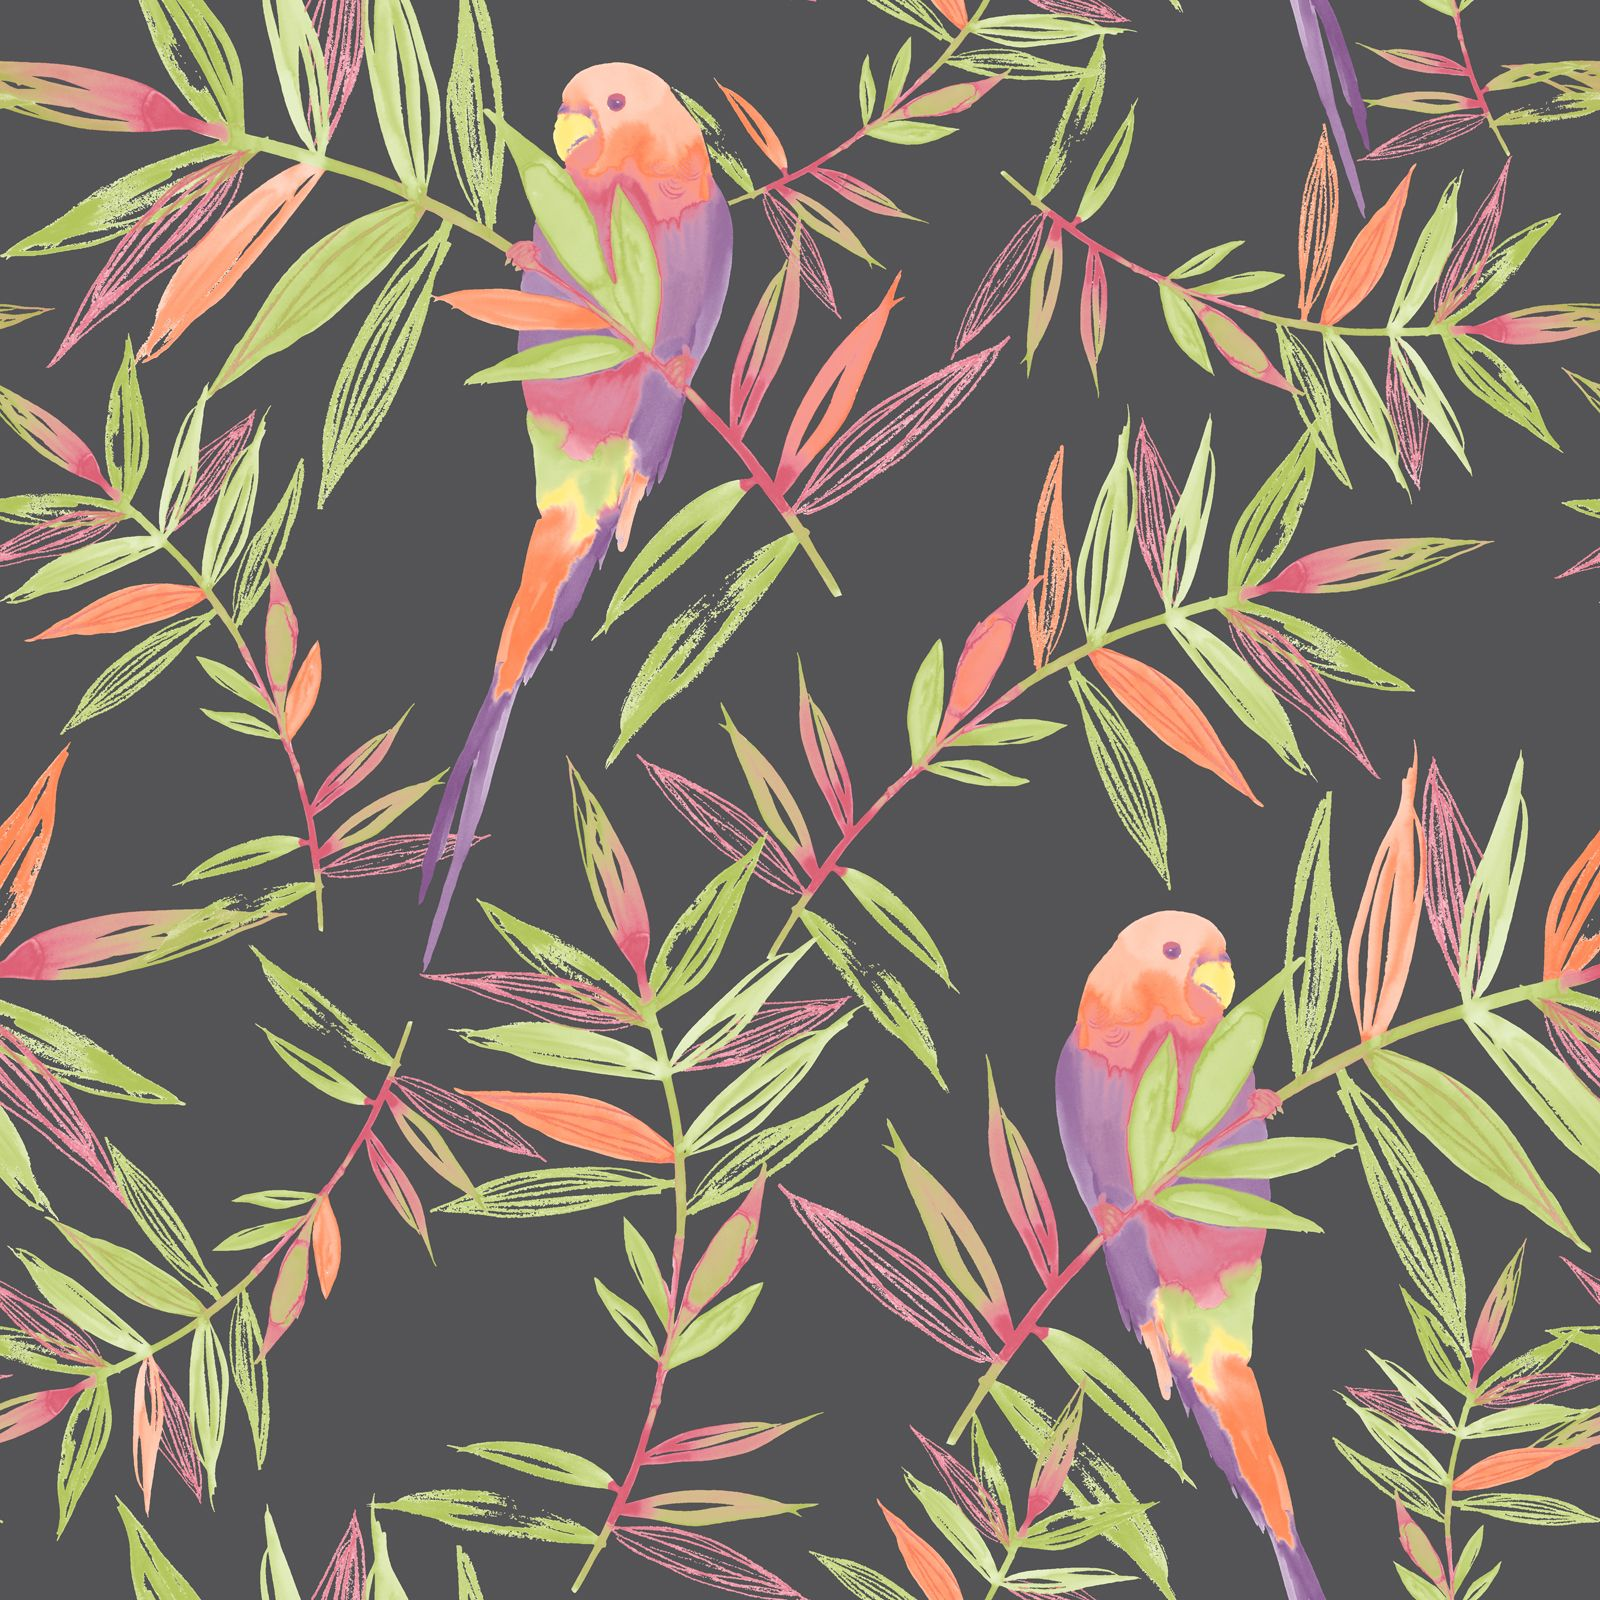 tropical bird wallpaper for walls - photo #2